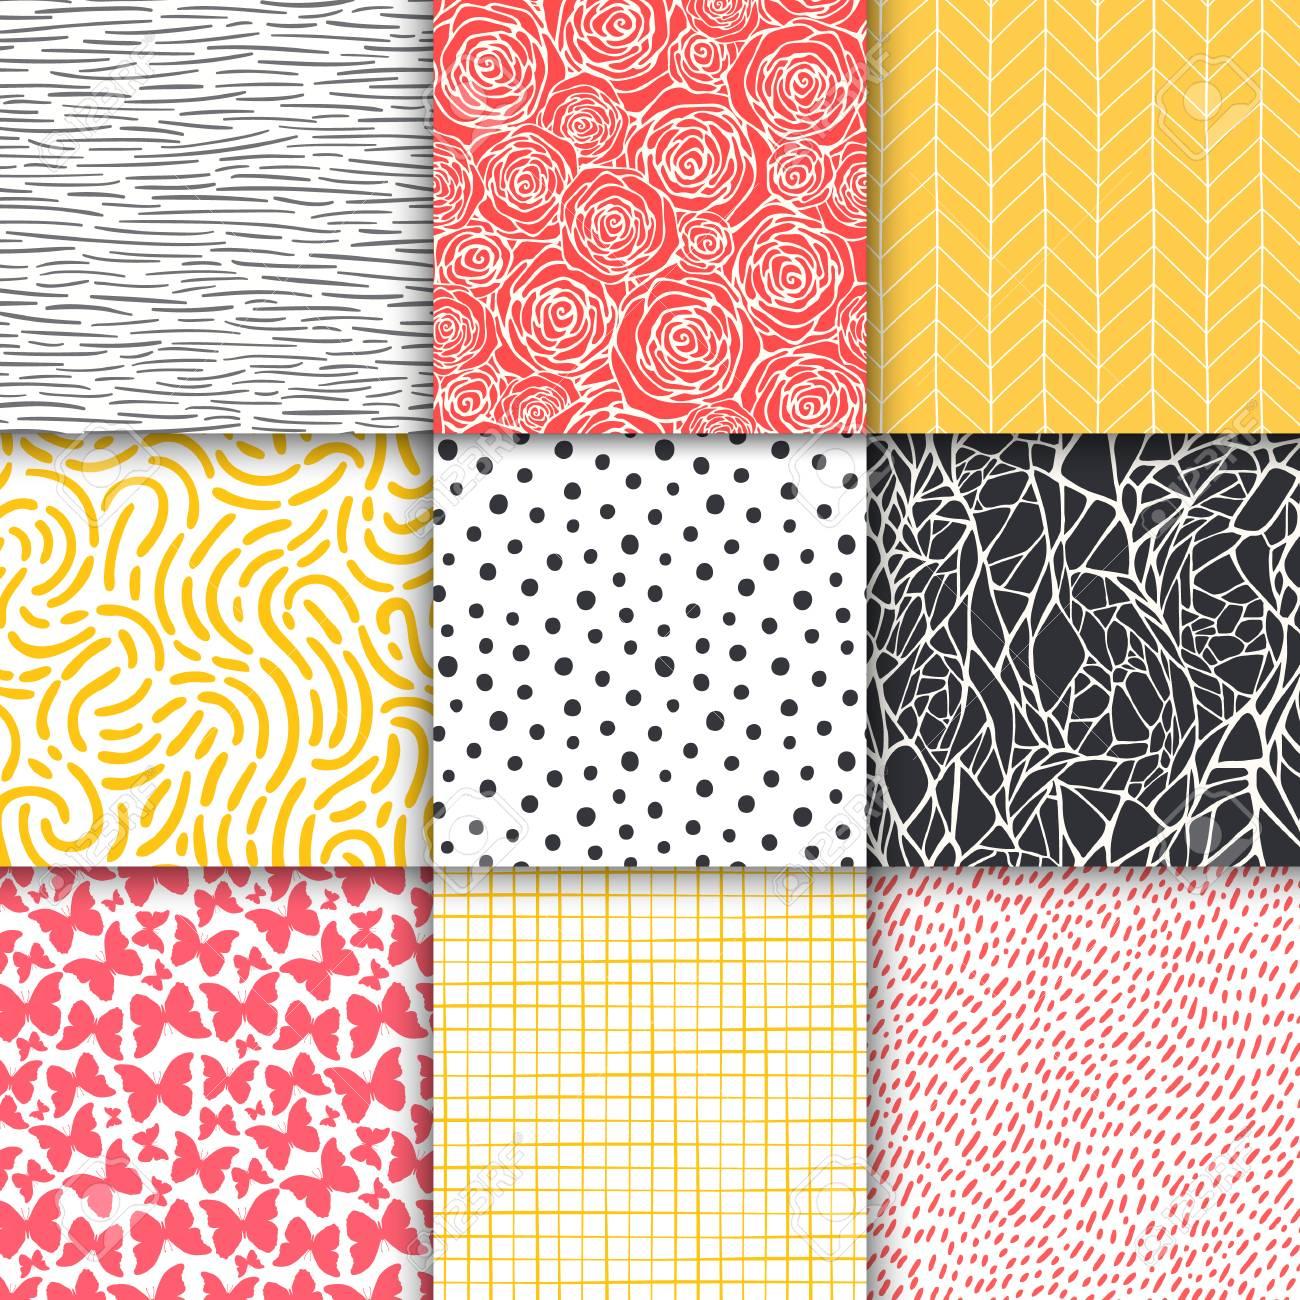 Abstract hand drawn geometric simple minimalistic seamless patterns set. Polka dot, stripes, waves, random symbols textures. Vector illustration - 120818988